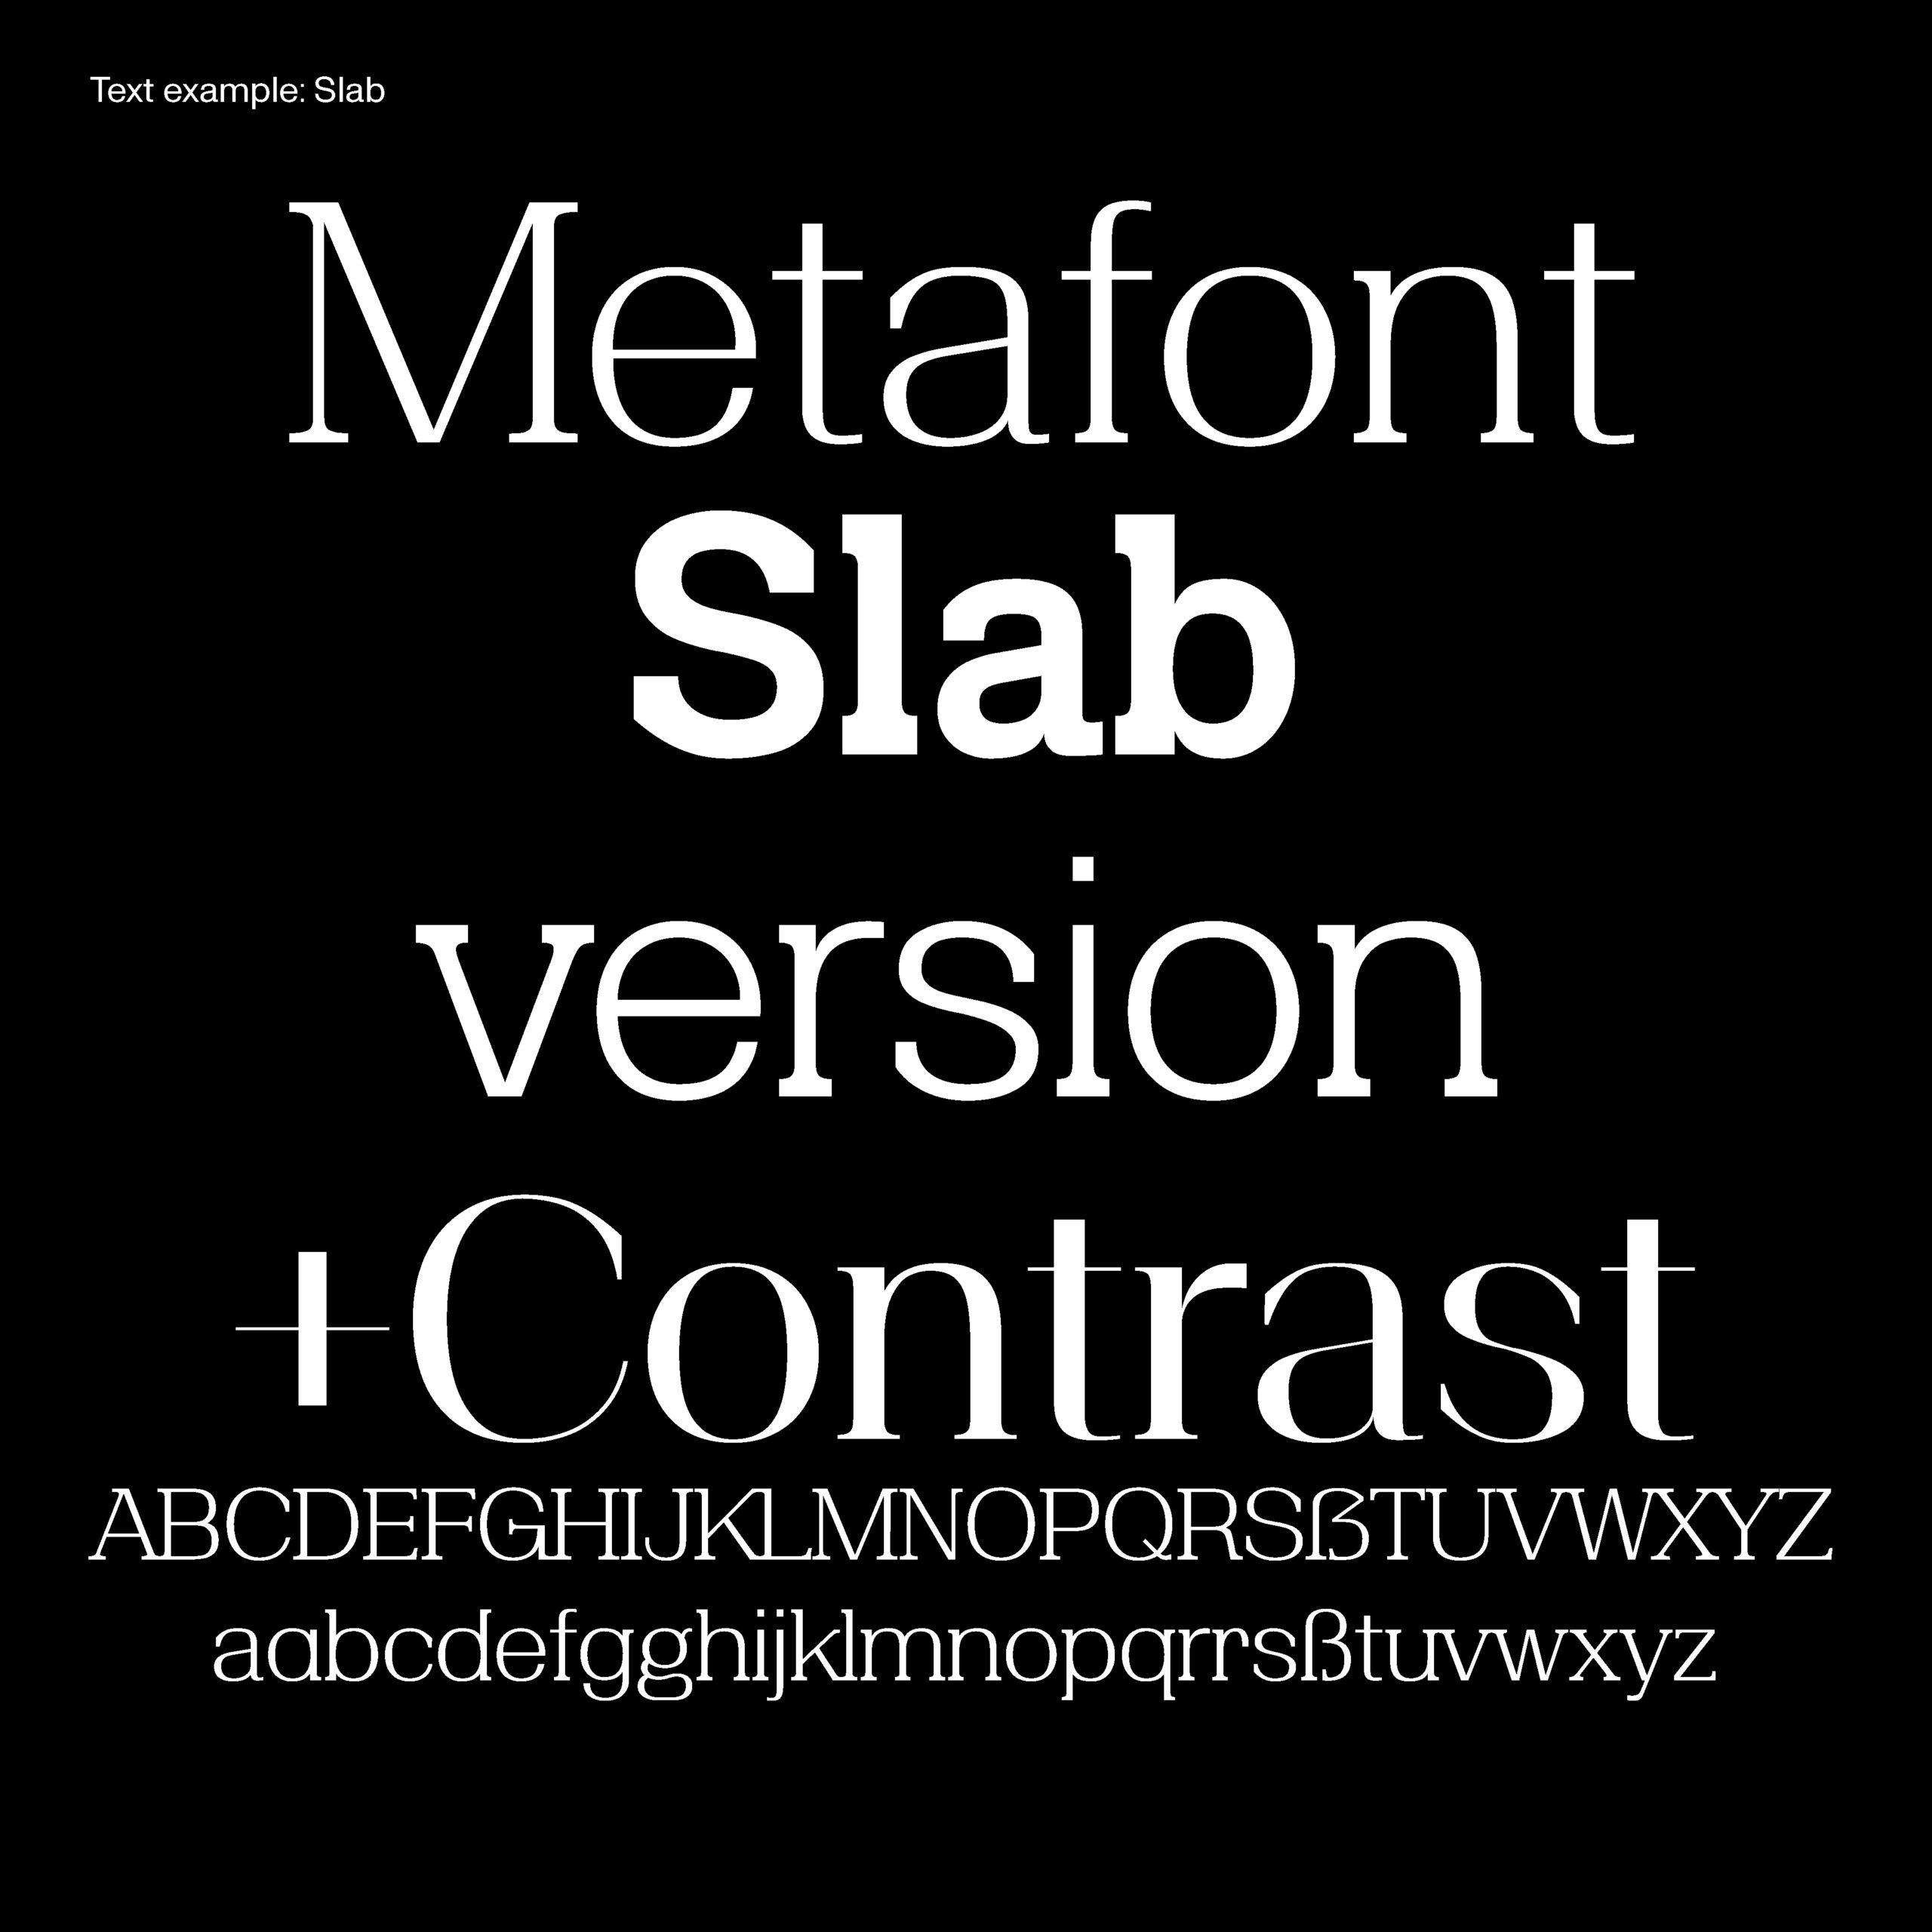 Daniel_Stuhlpfarrer_Spekulative-Schriftgestaltung-Speculative-Type-Design_WEB-new23